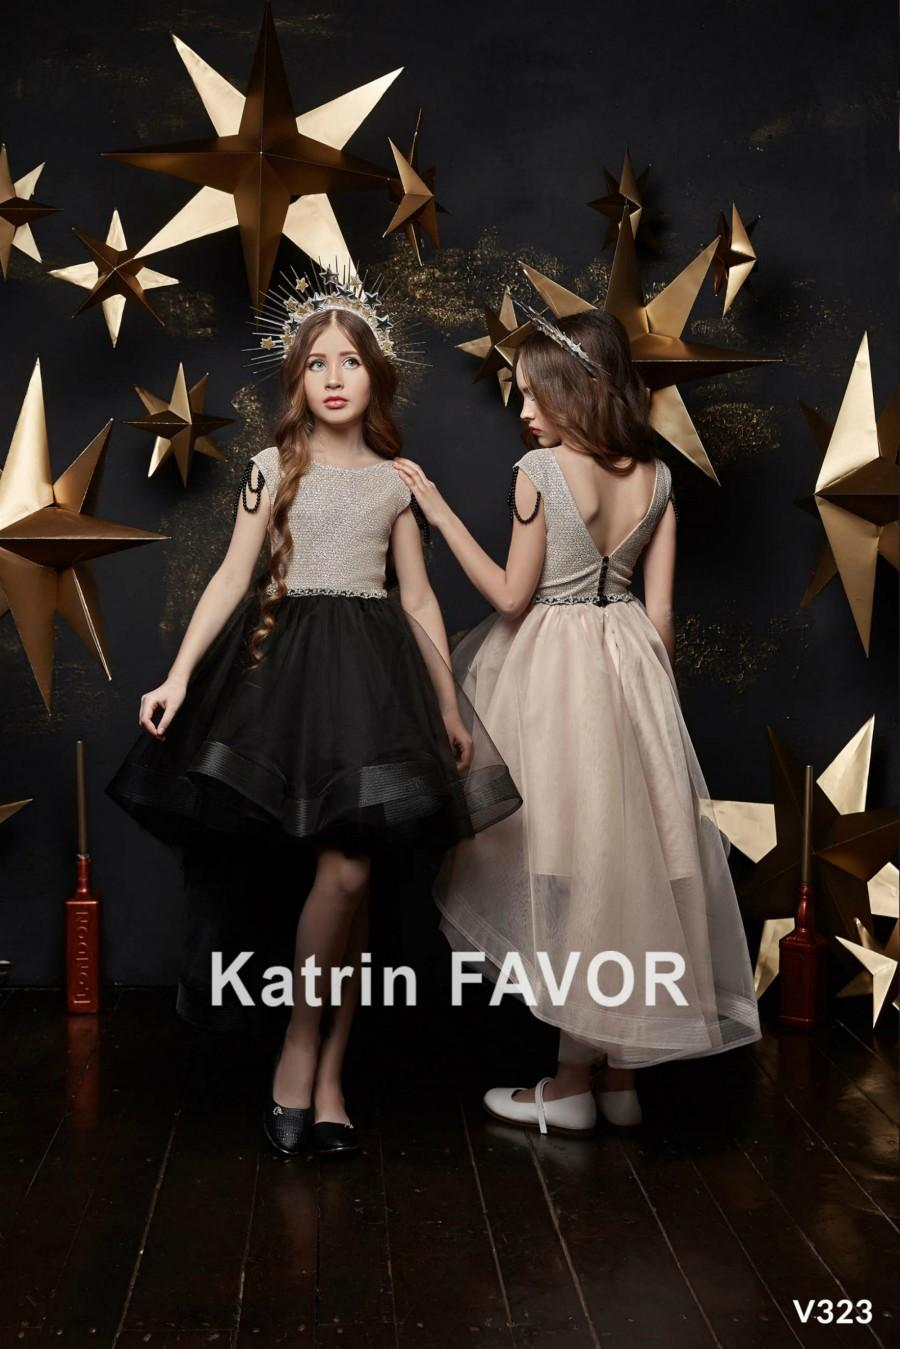 Wedding - Flower Girl Dress Toddler Dress Birthday Party Dress Christmas Dress High Low Baby Dress Asymmetrical Girls Dress Fit And Flare Dress